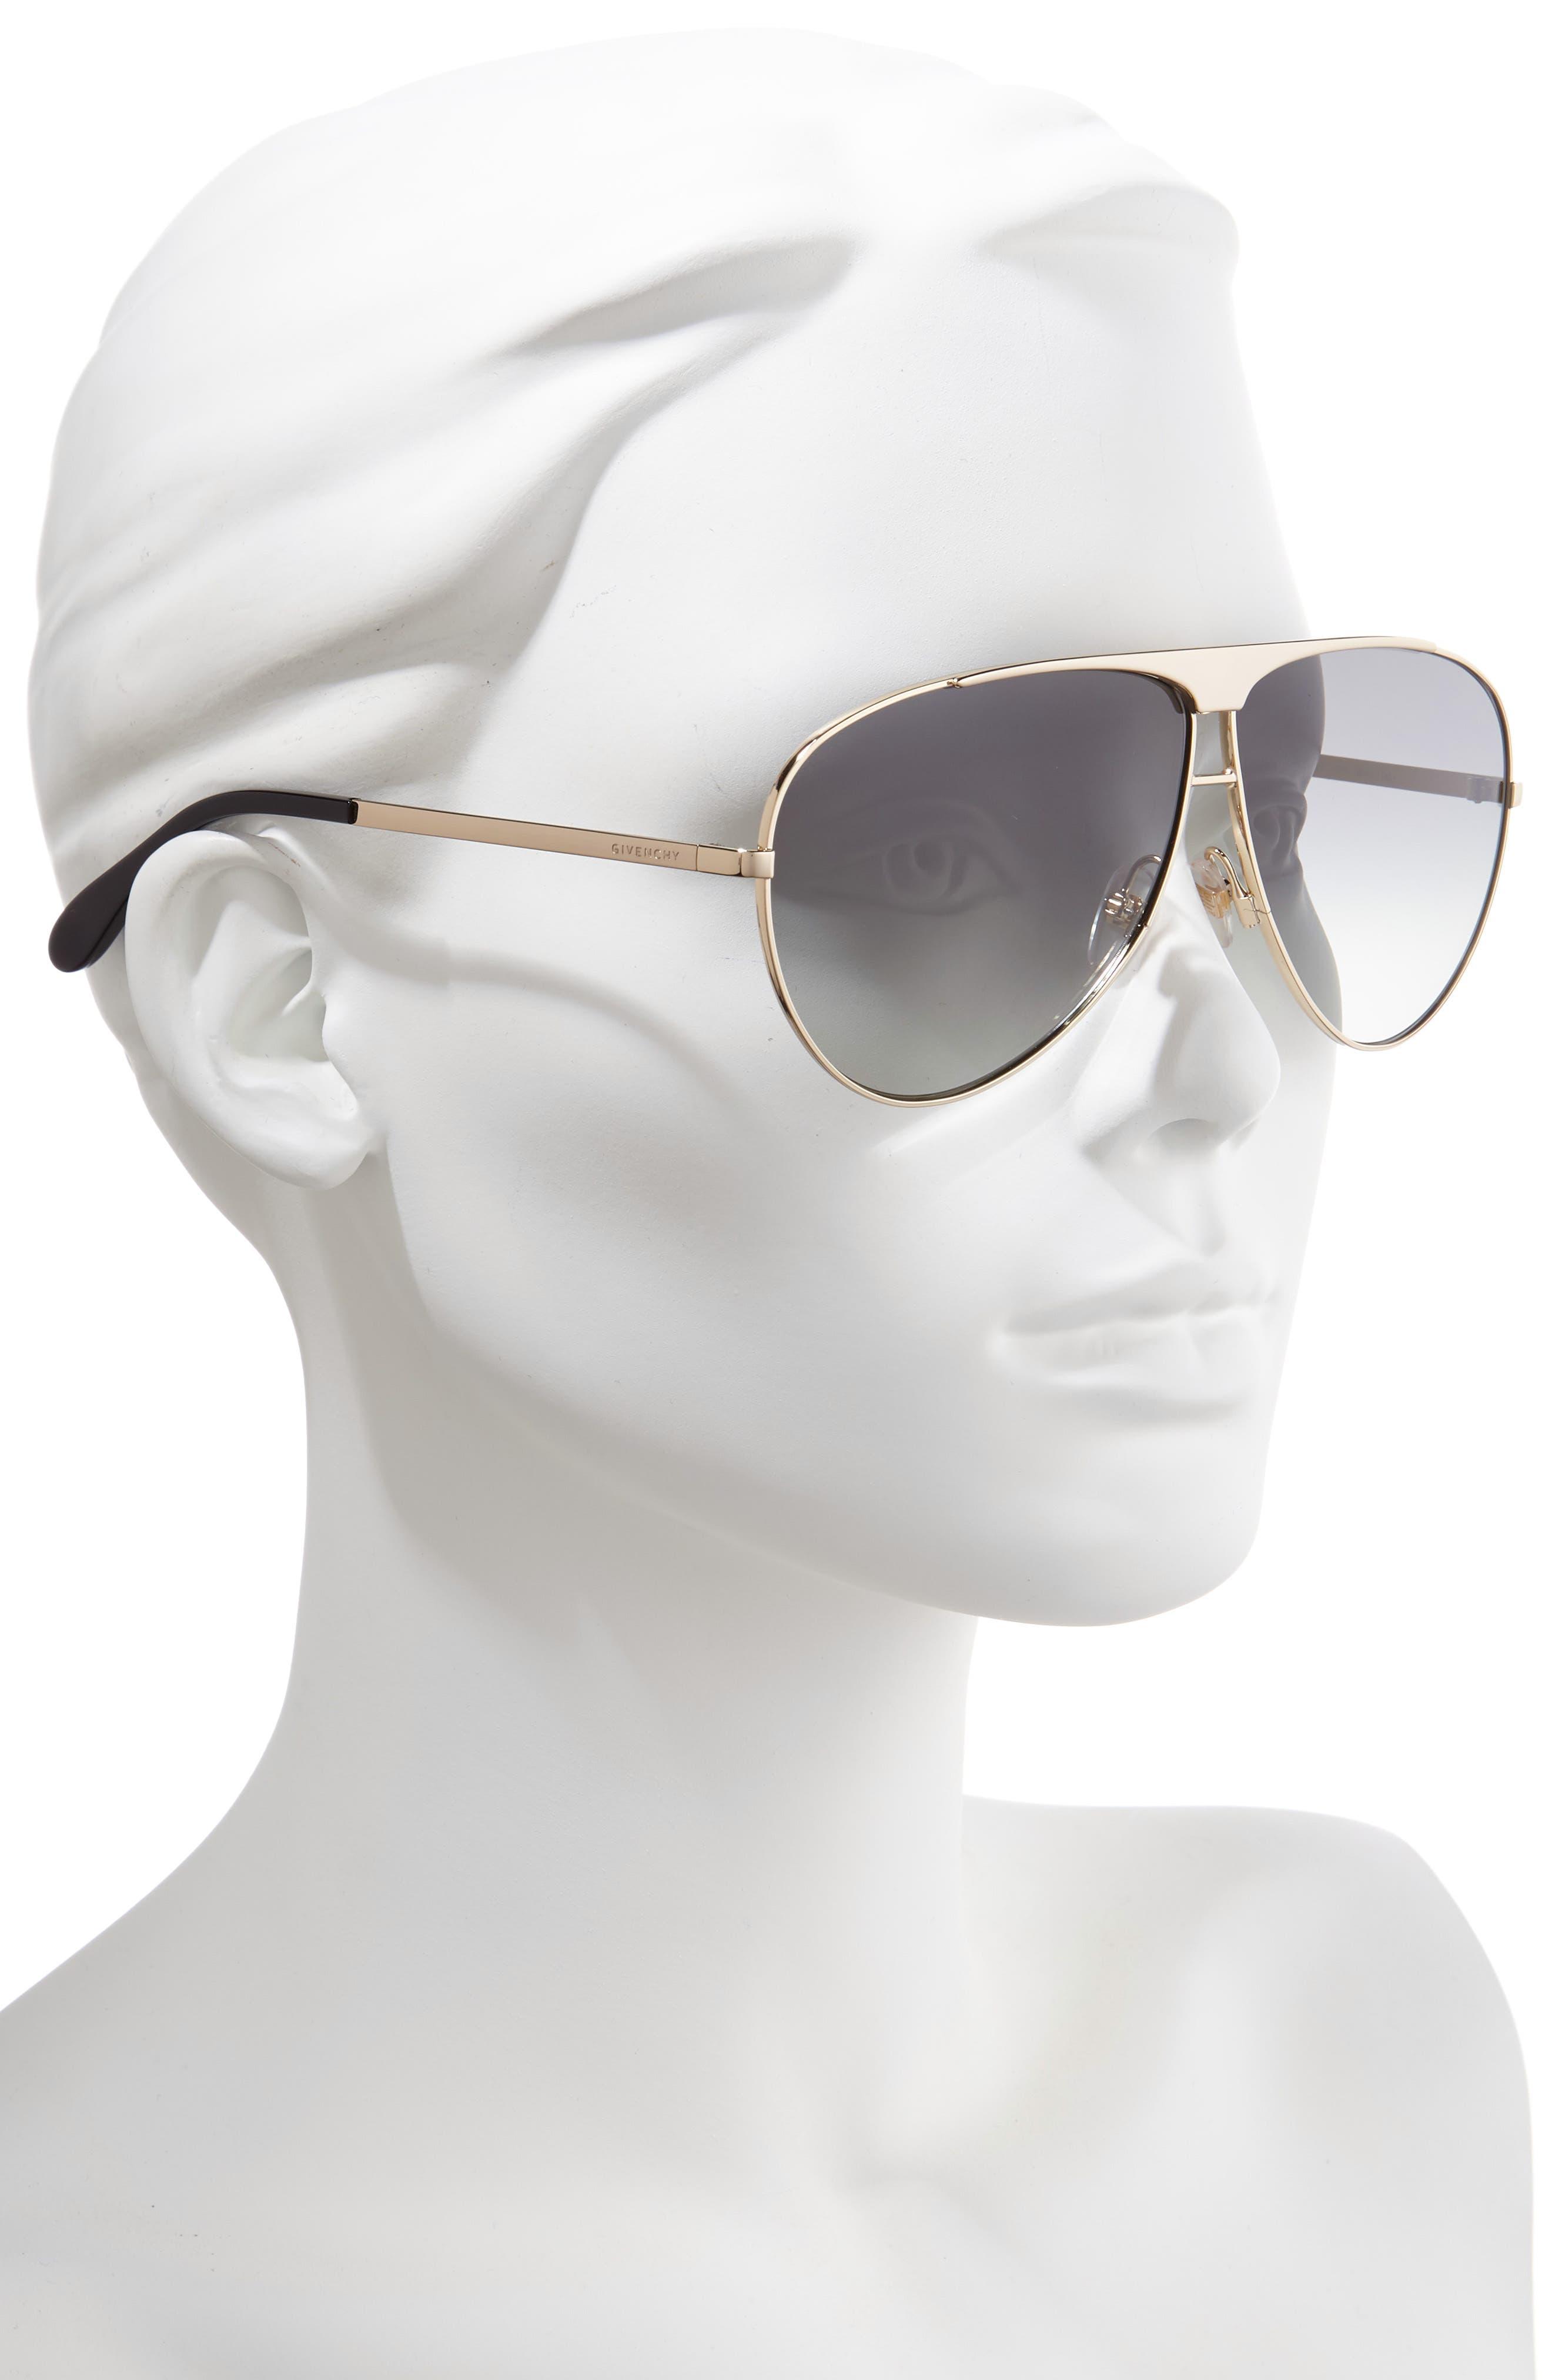 66mm Aviator Sunglasses,                             Alternate thumbnail 2, color,                             710